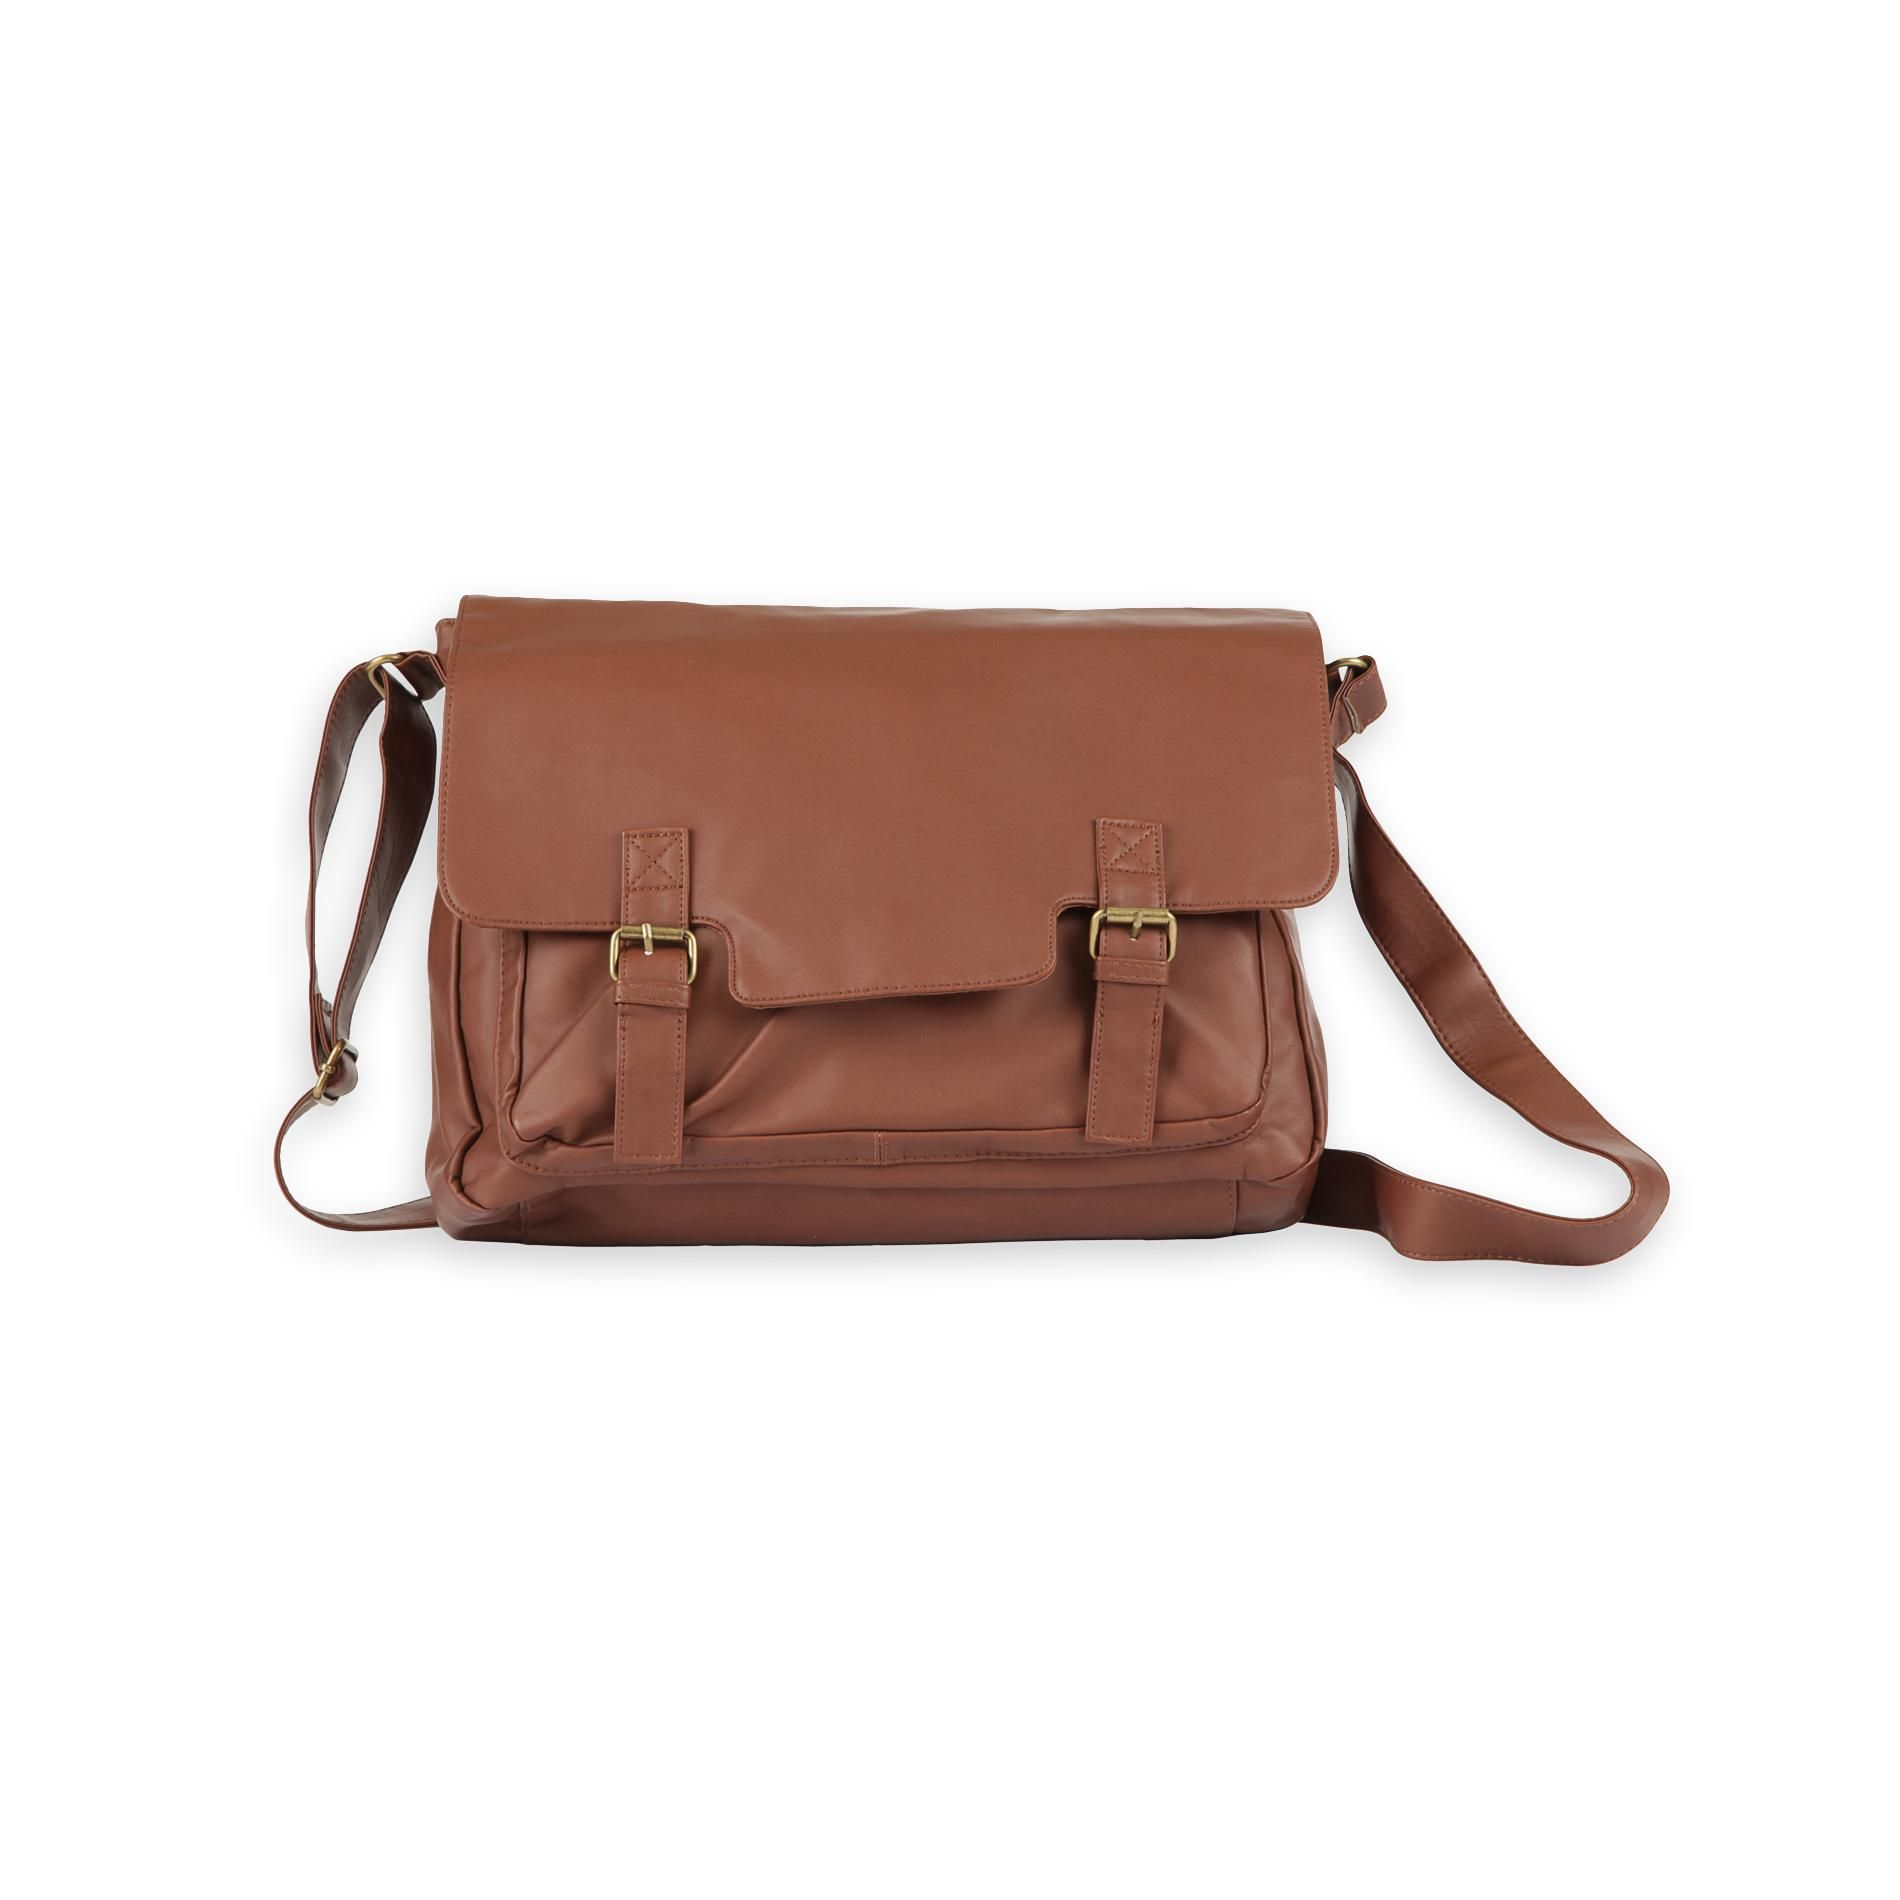 7572229eea0 Bongo Junior s Faux Leather Messenger Bag - For the Home - Backpacks   Messenger  Bags - Messenger Bags